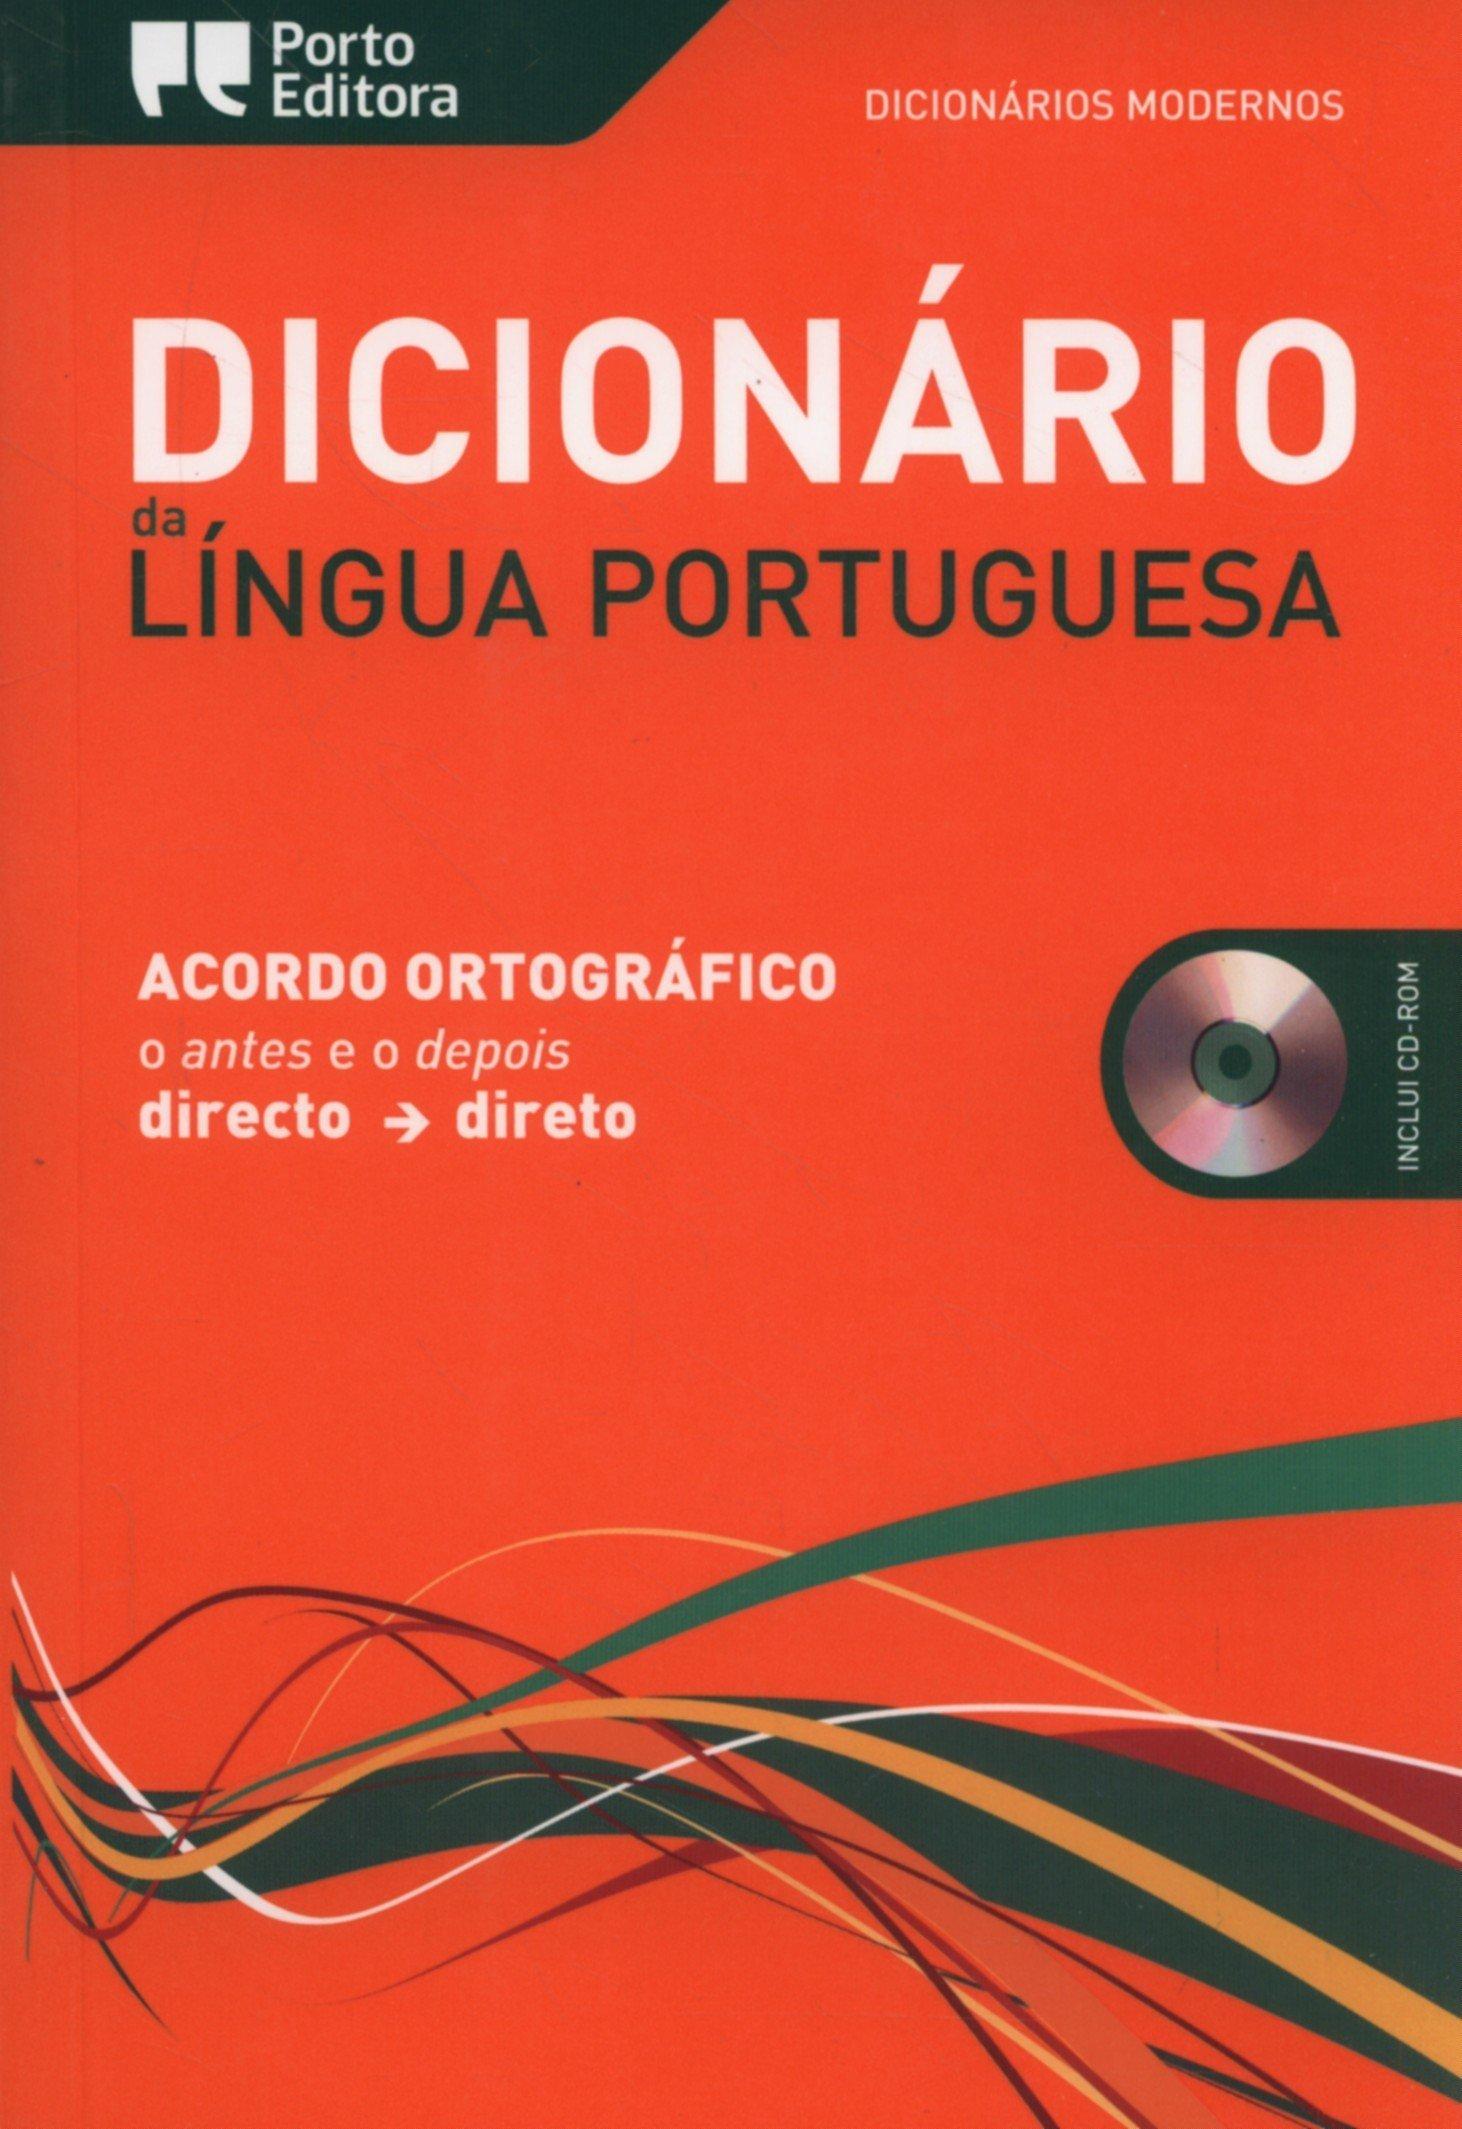 Porta Cd Design Moderno.D Moderno Da Lingua Portuguesa Cd Rom Porto Editora